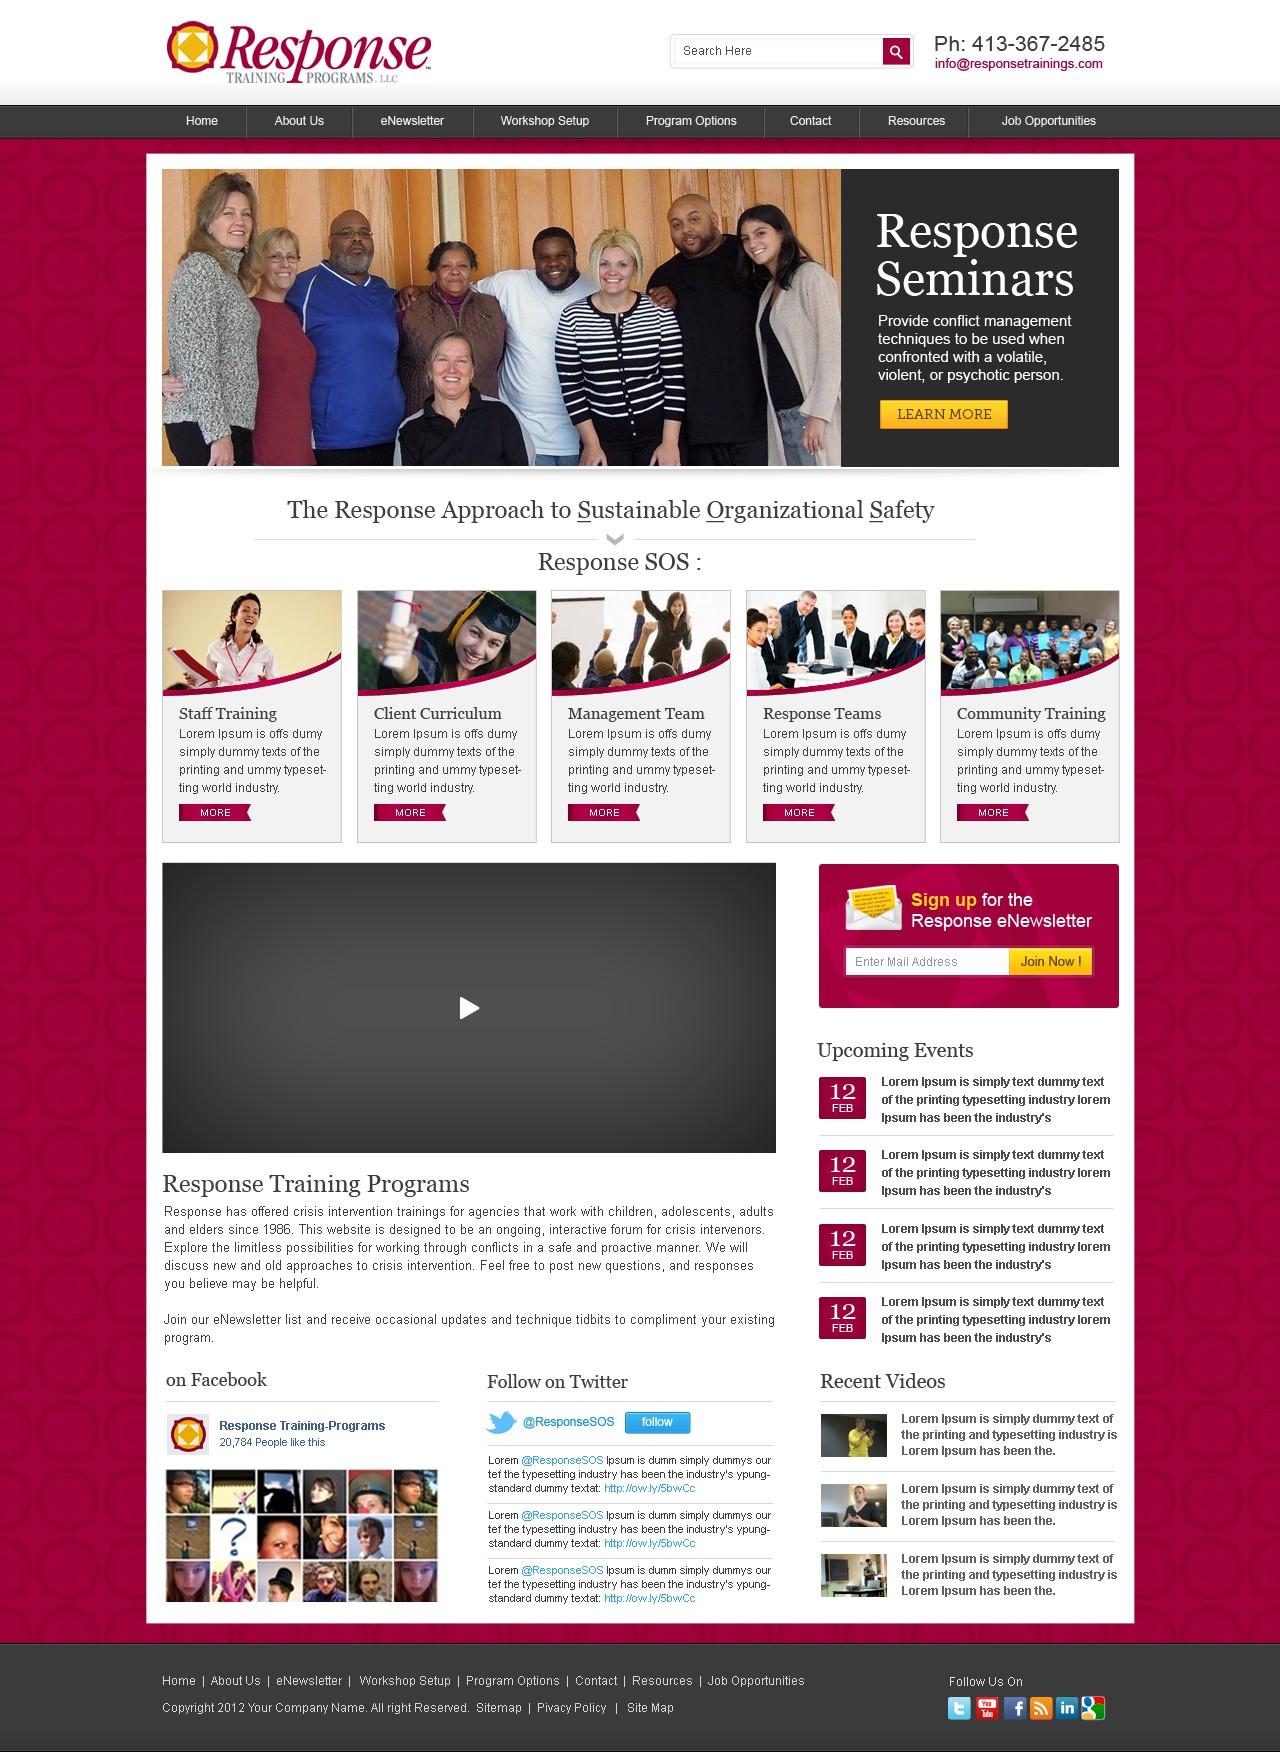 Wordpress design for Response Training Programs, LLC